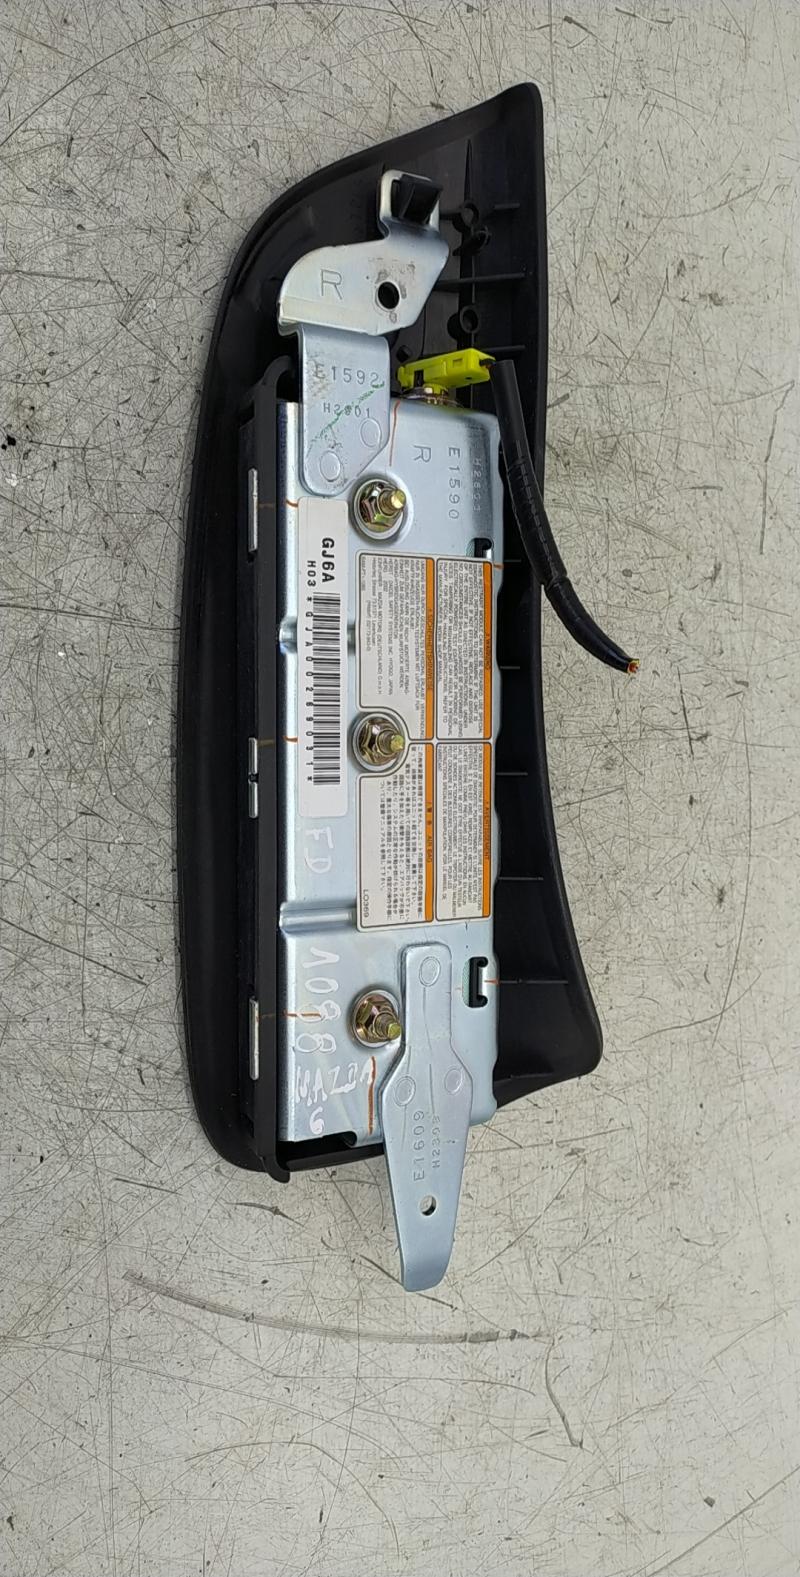 Airbag banco fte dto (20246497).